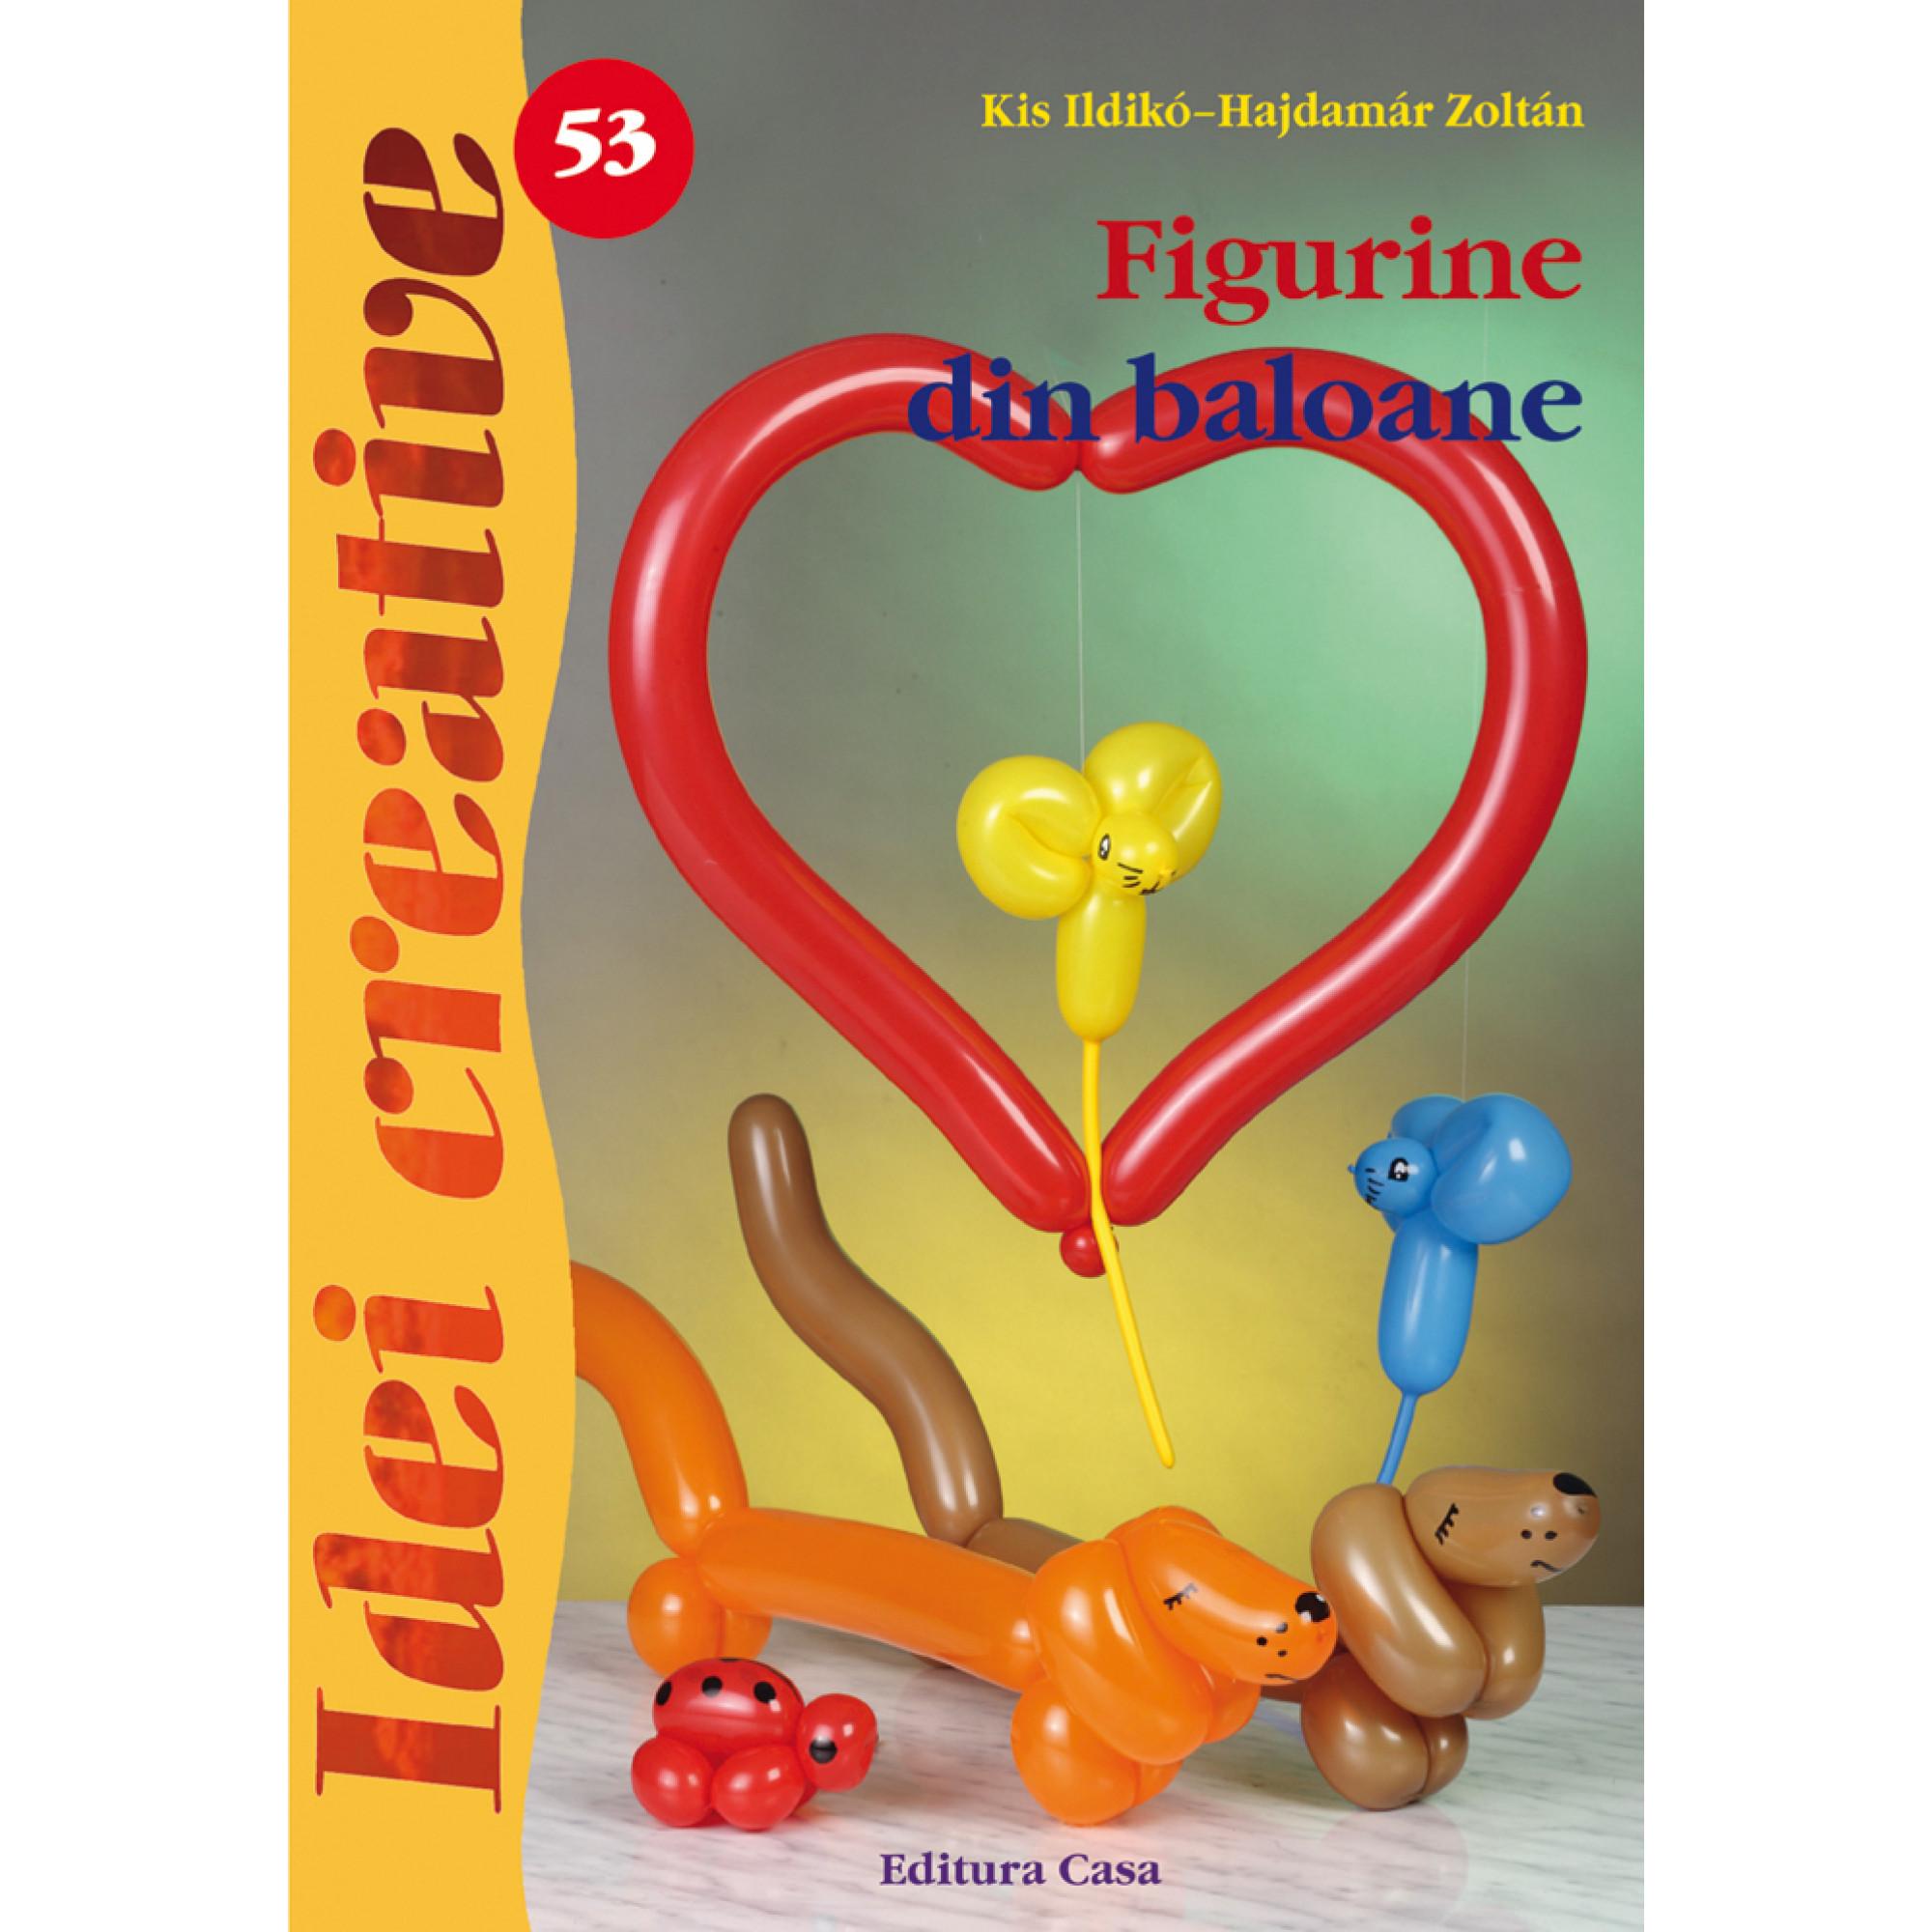 Figurine din baloane - Ed. a II-a